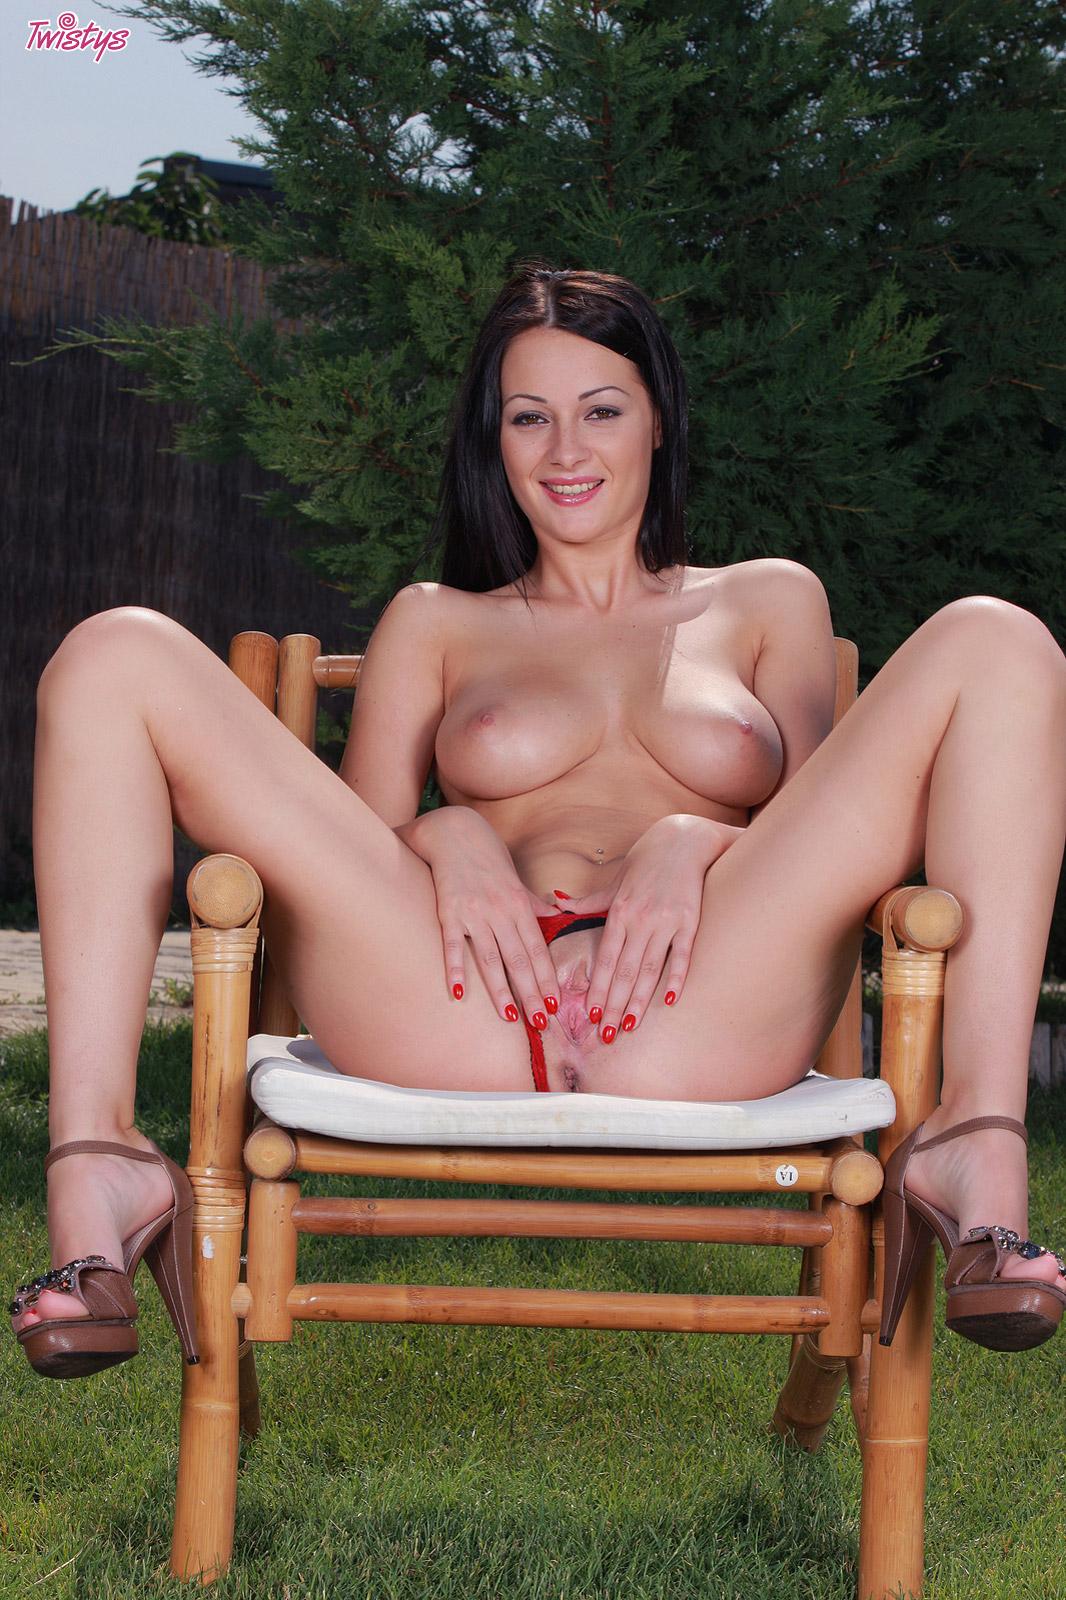 Dana weyron plays with her big tits 5